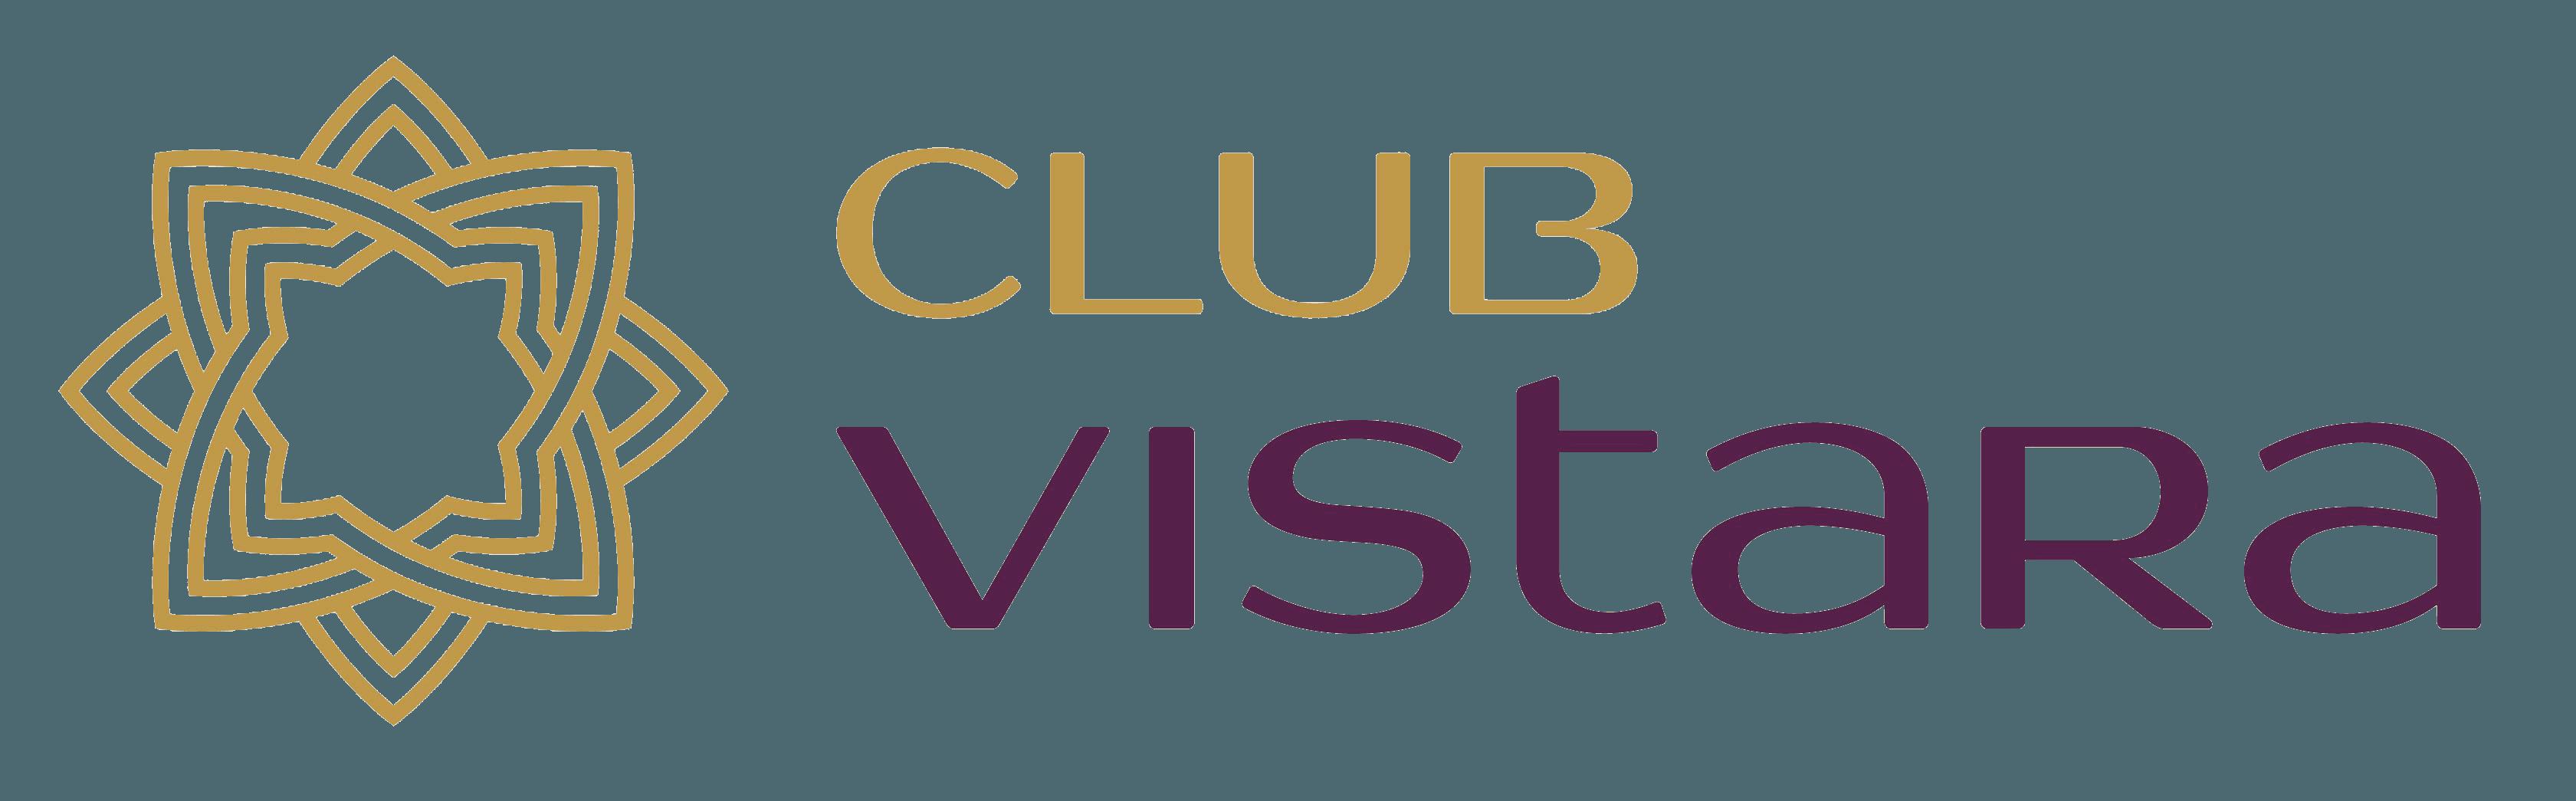 Club Vistara Logo